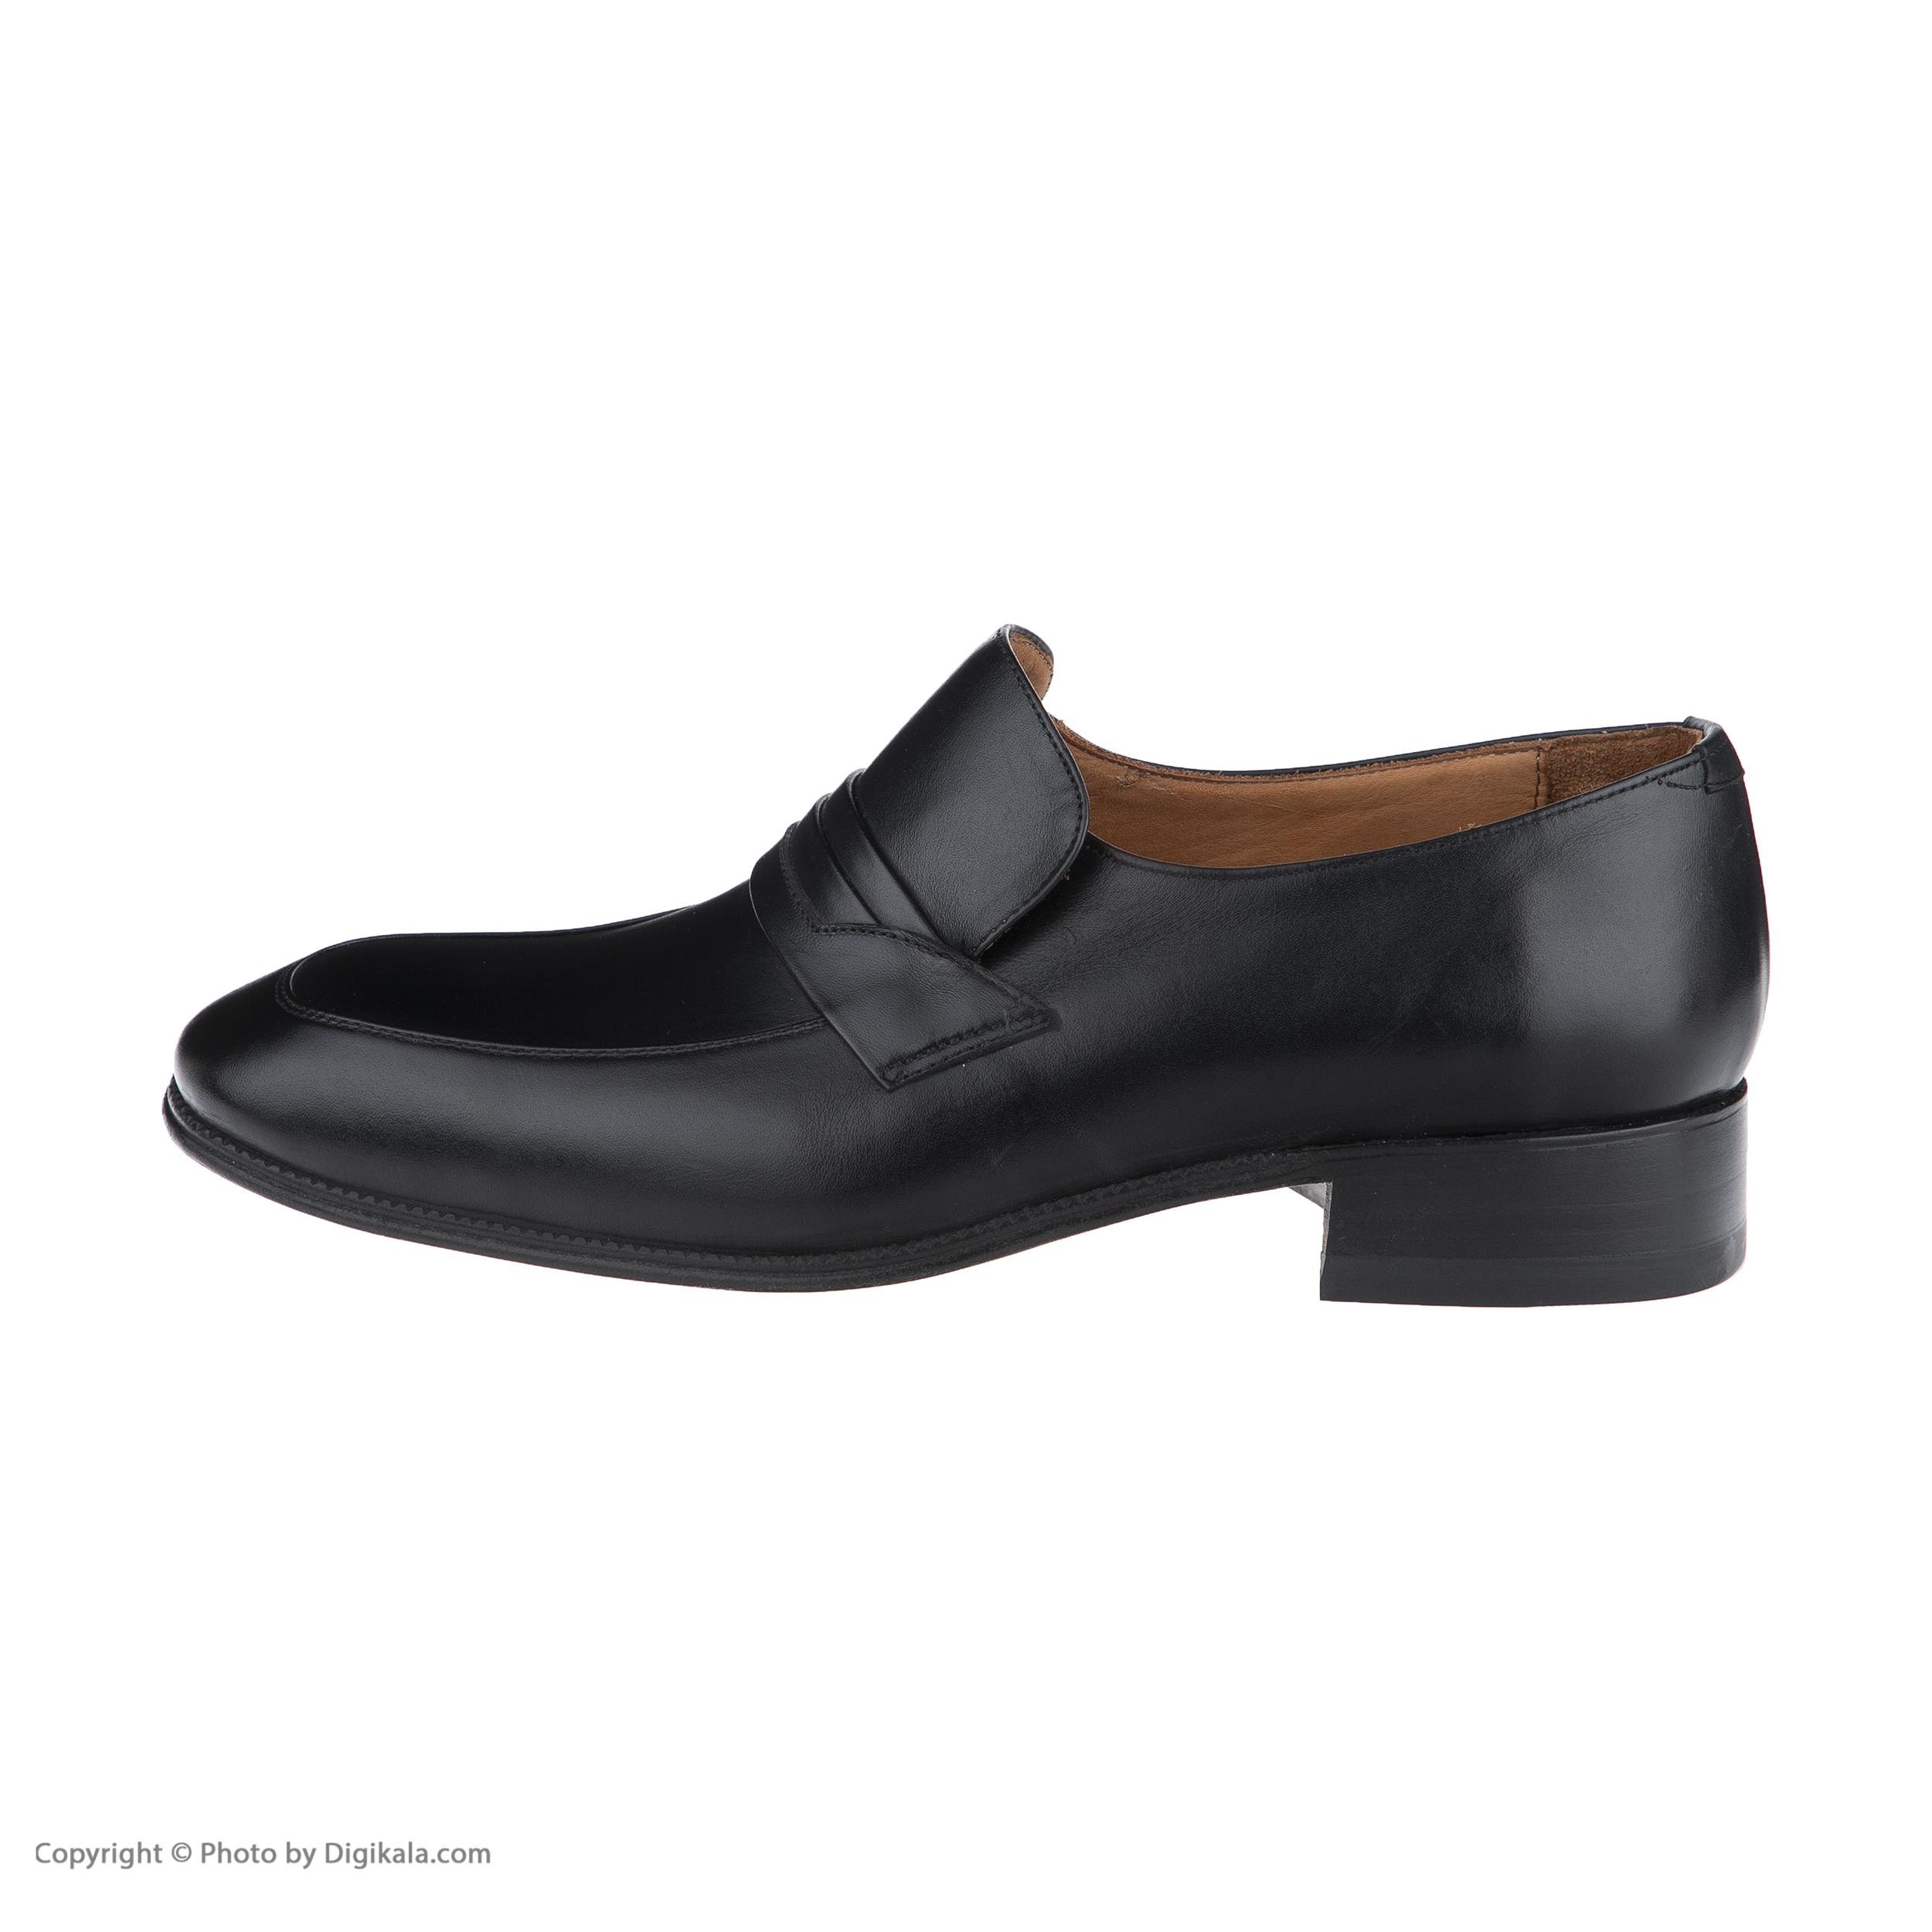 کفش مردانه نظری کد 416 -  - 1